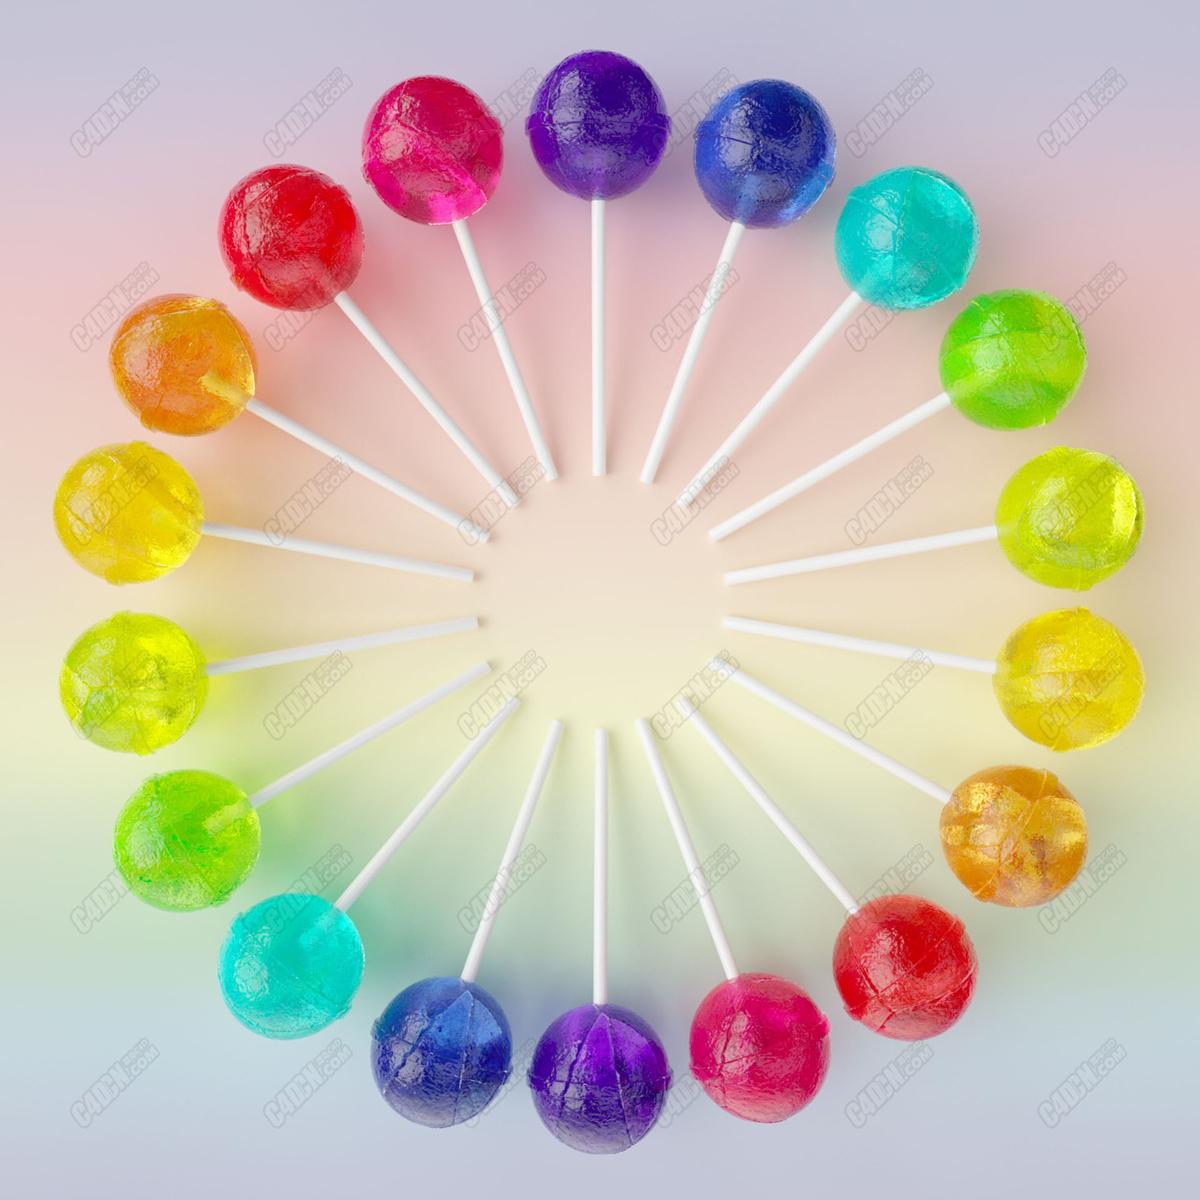 C4D五颜六色的棒棒糖果食品模型